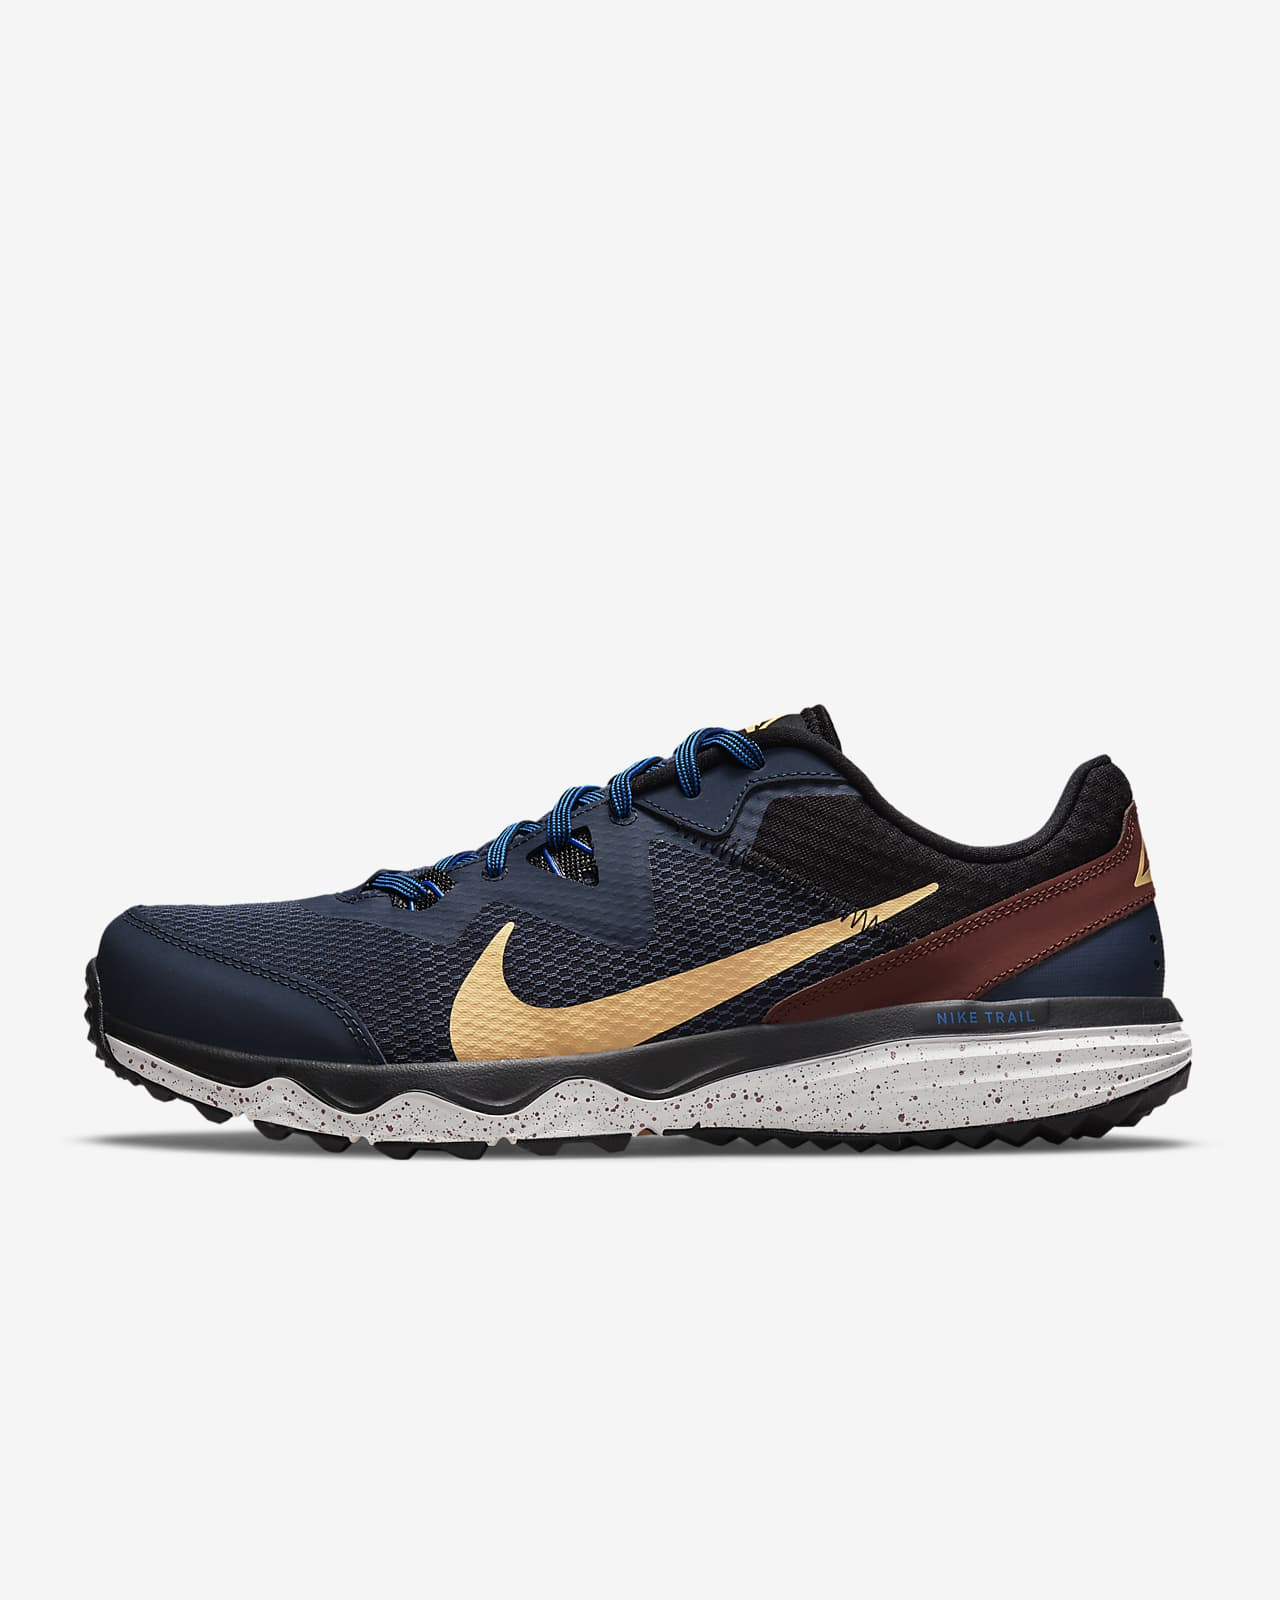 Sapatilhas de running Nike Juniper Trail para homem